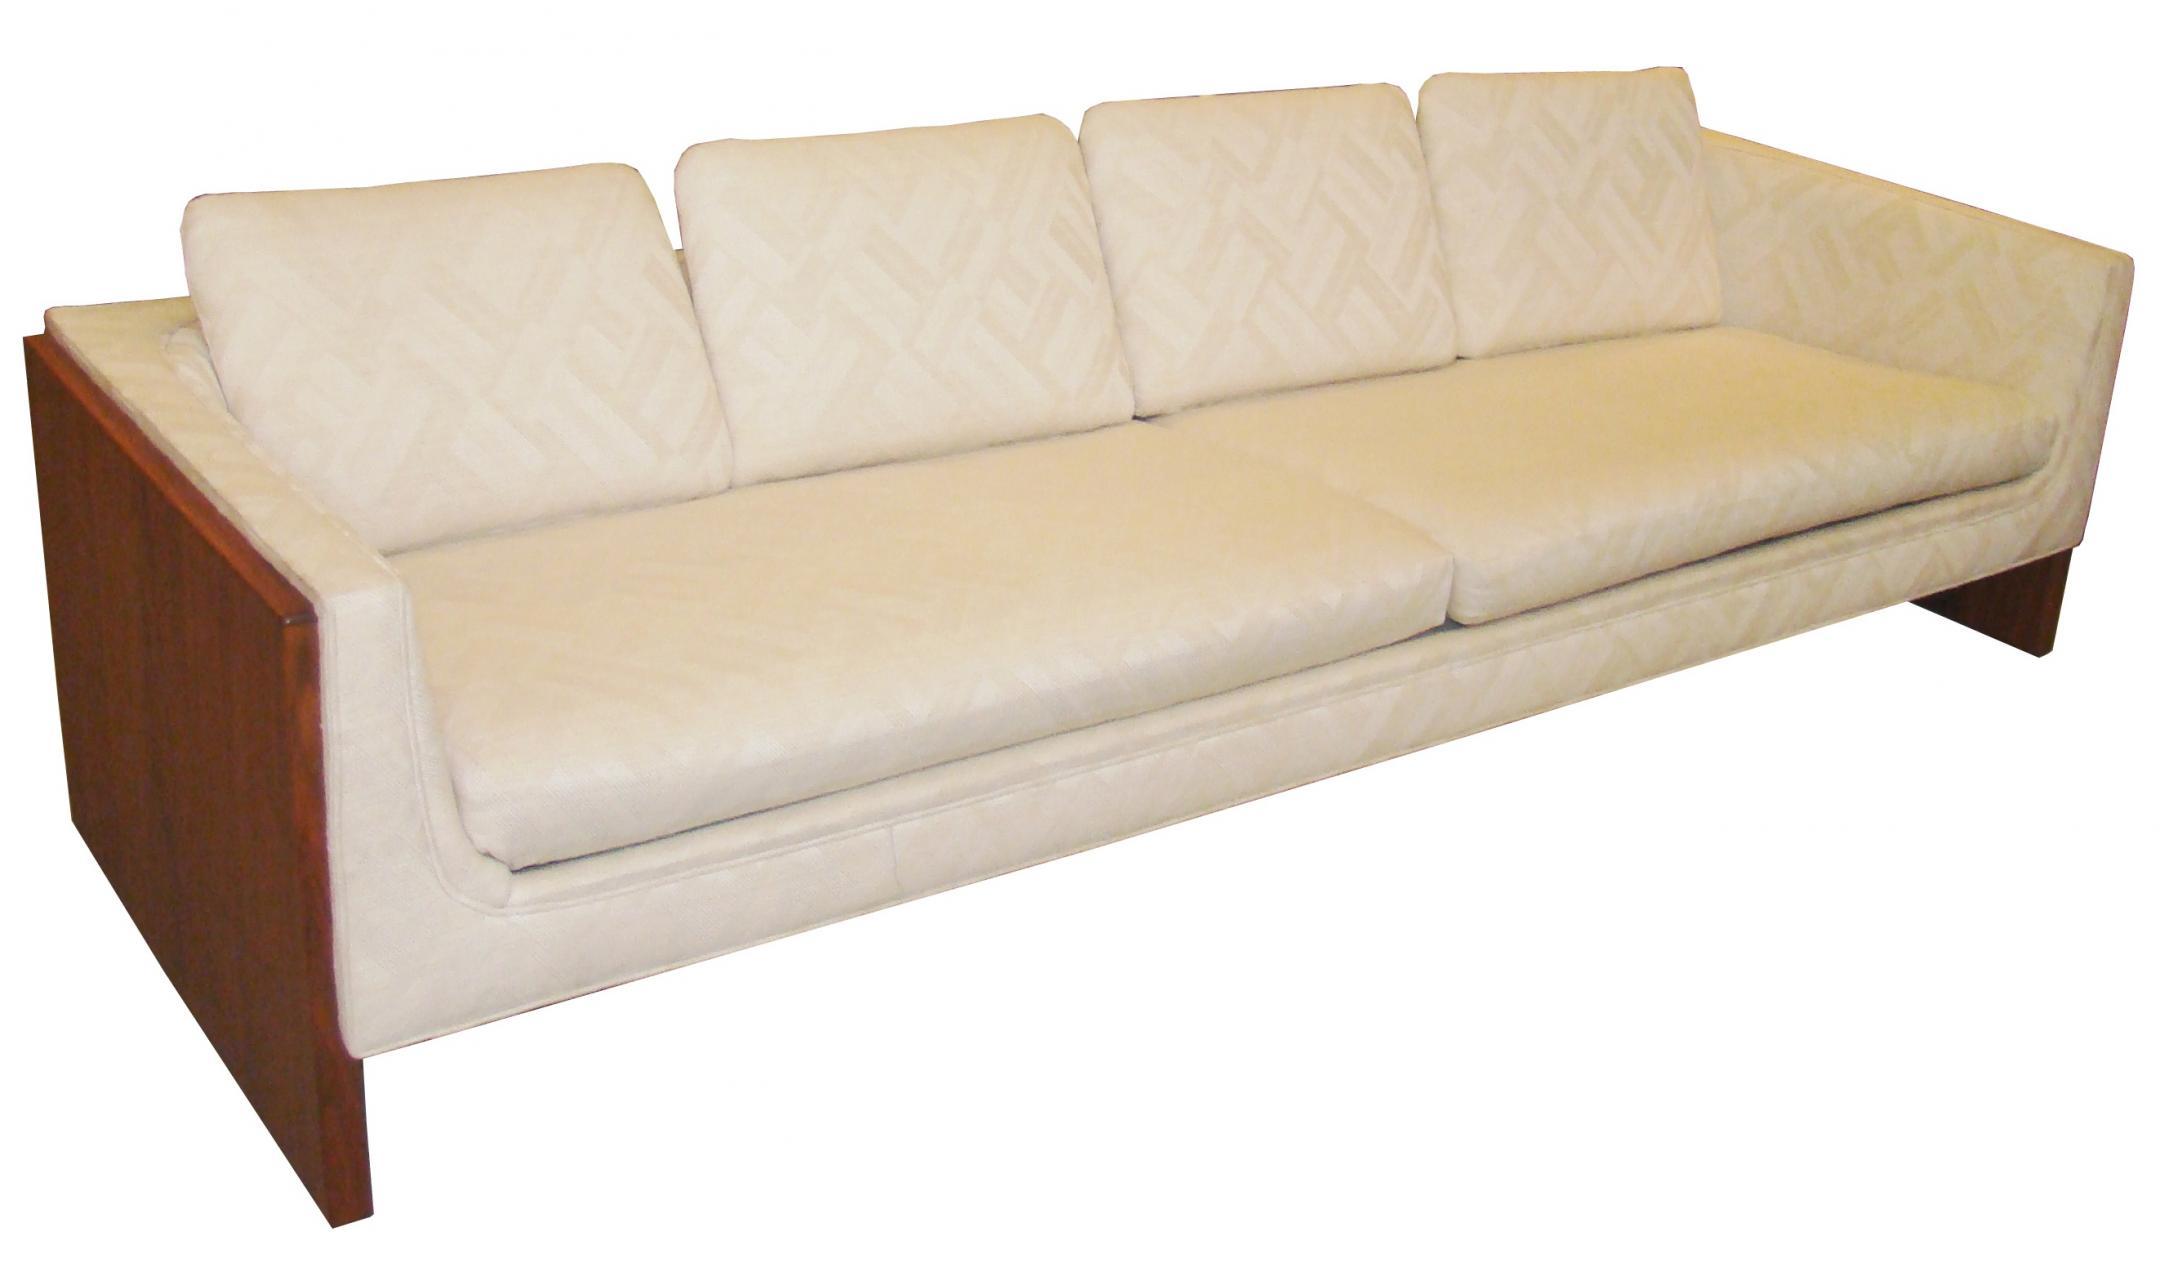 Very Elegant Sleek Low 1970 39 S Mid Century Modern Sofa